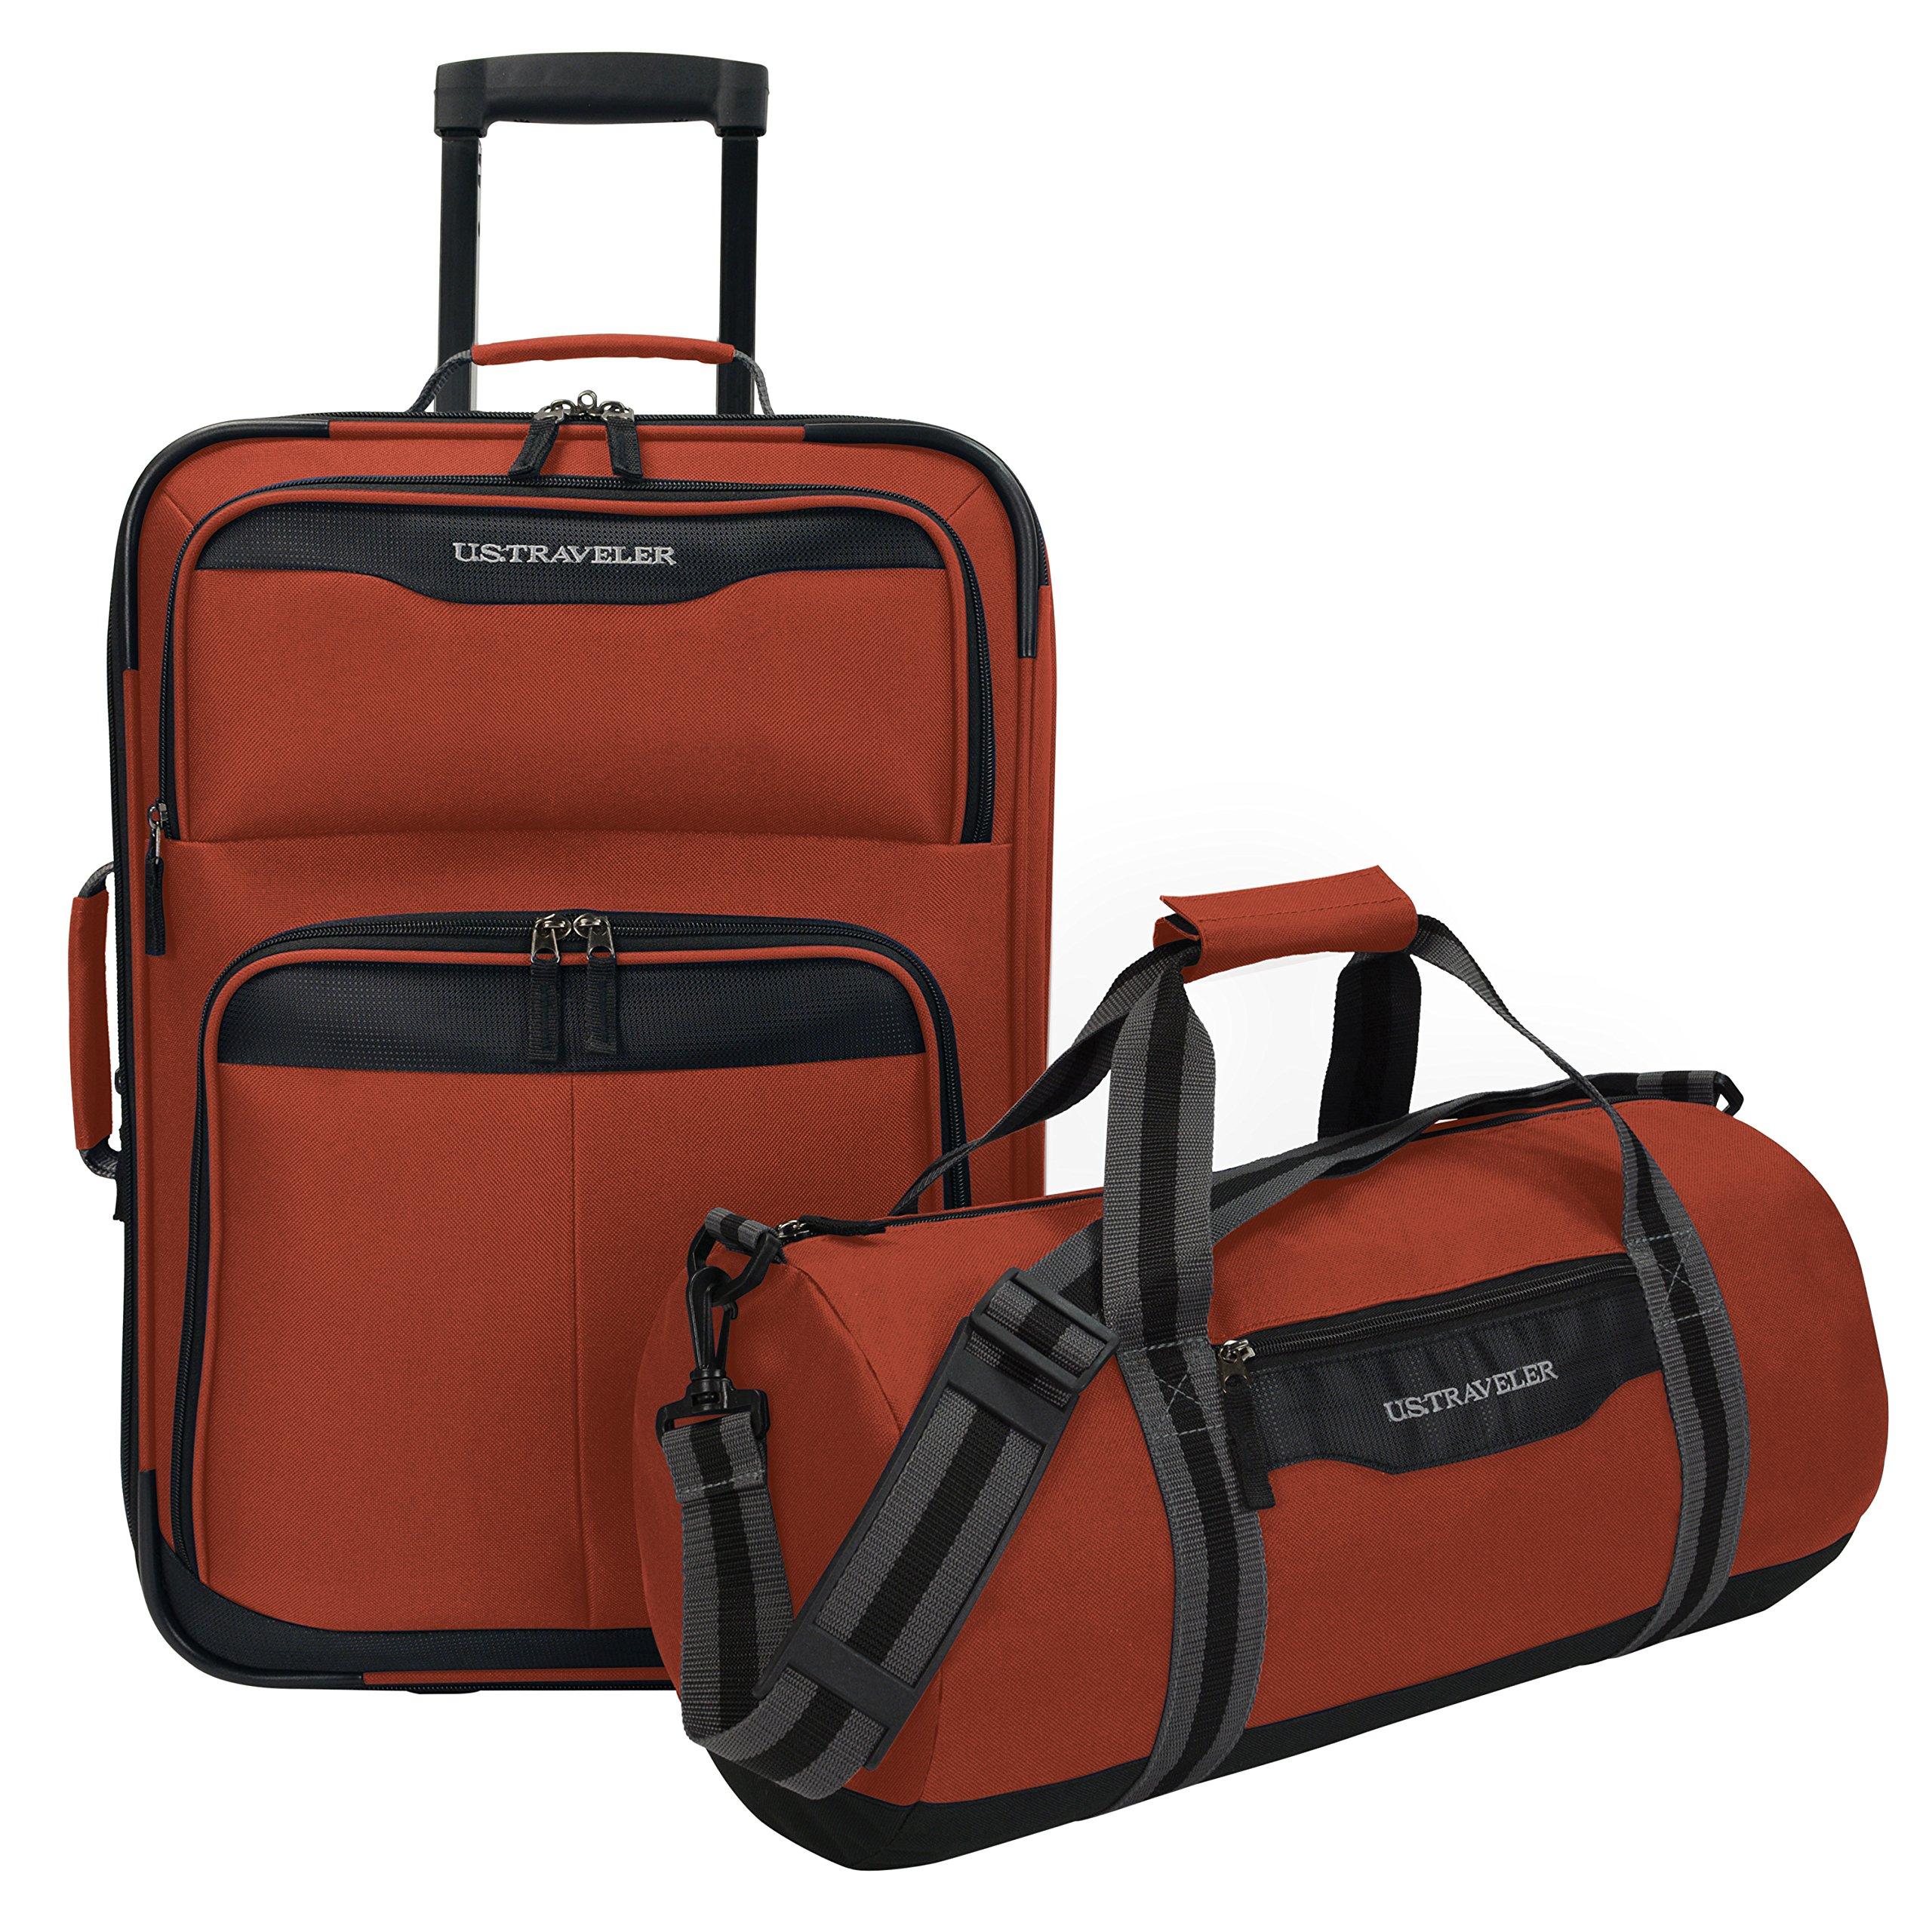 U.S. Traveler Hillstar Carry-on Expandable Rolling Luggage Set, Salmon